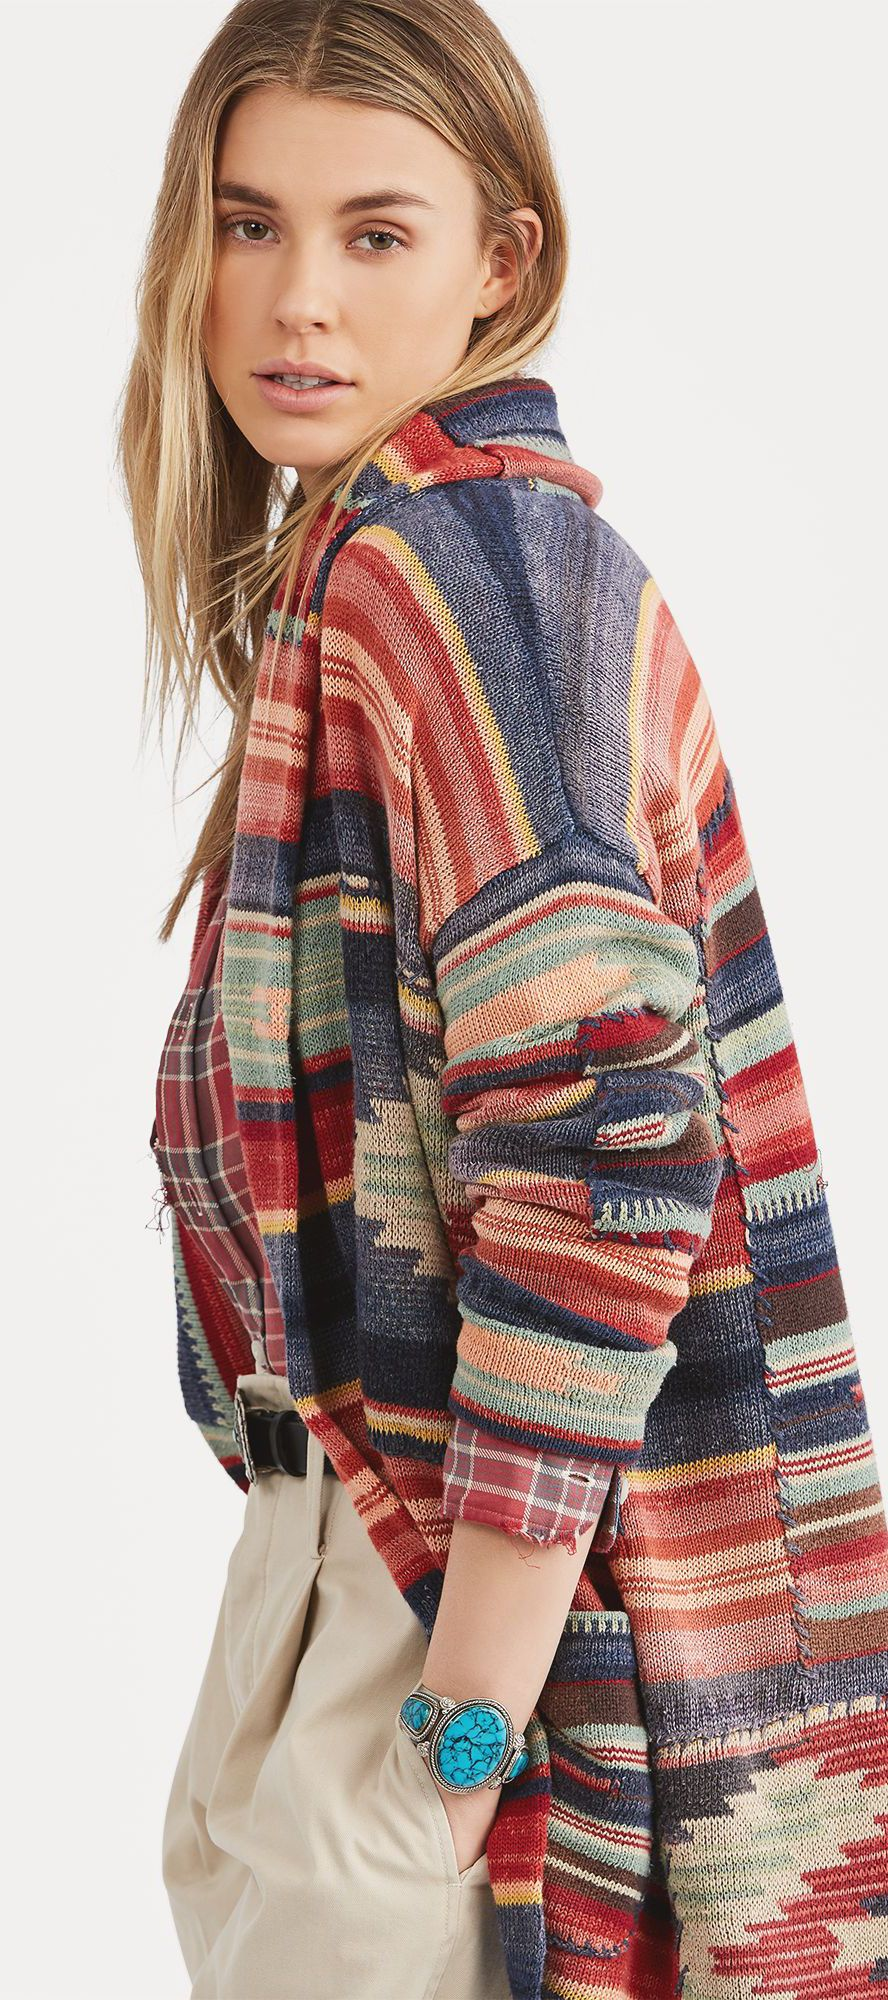 Ralph Lauren Sweater #ralphlauren | Western fashion